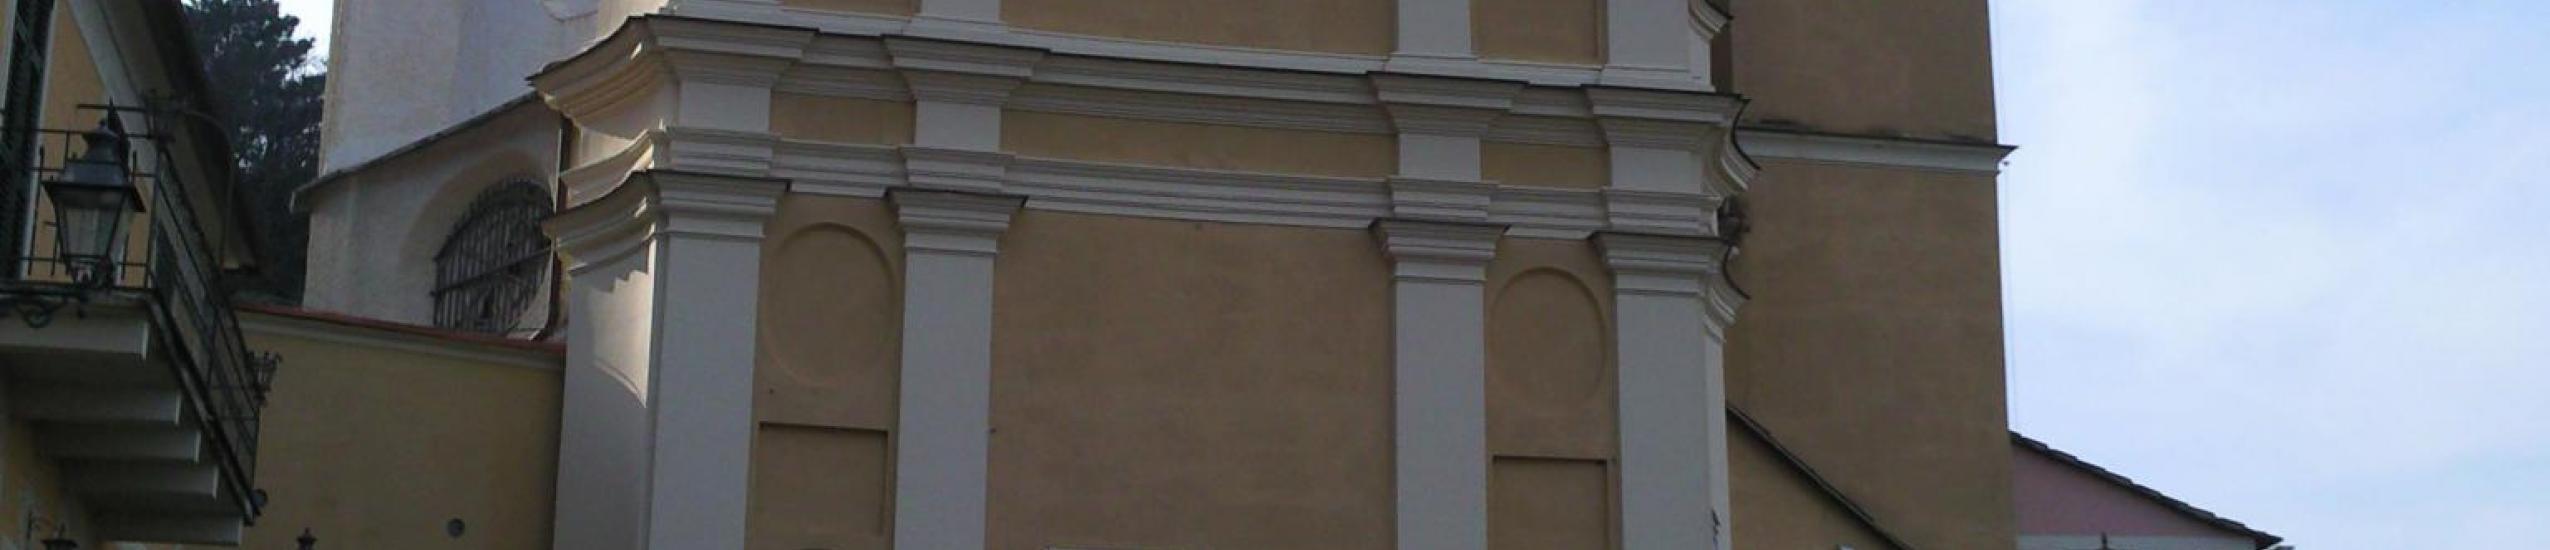 chiesa s.m. assunta di nozarego